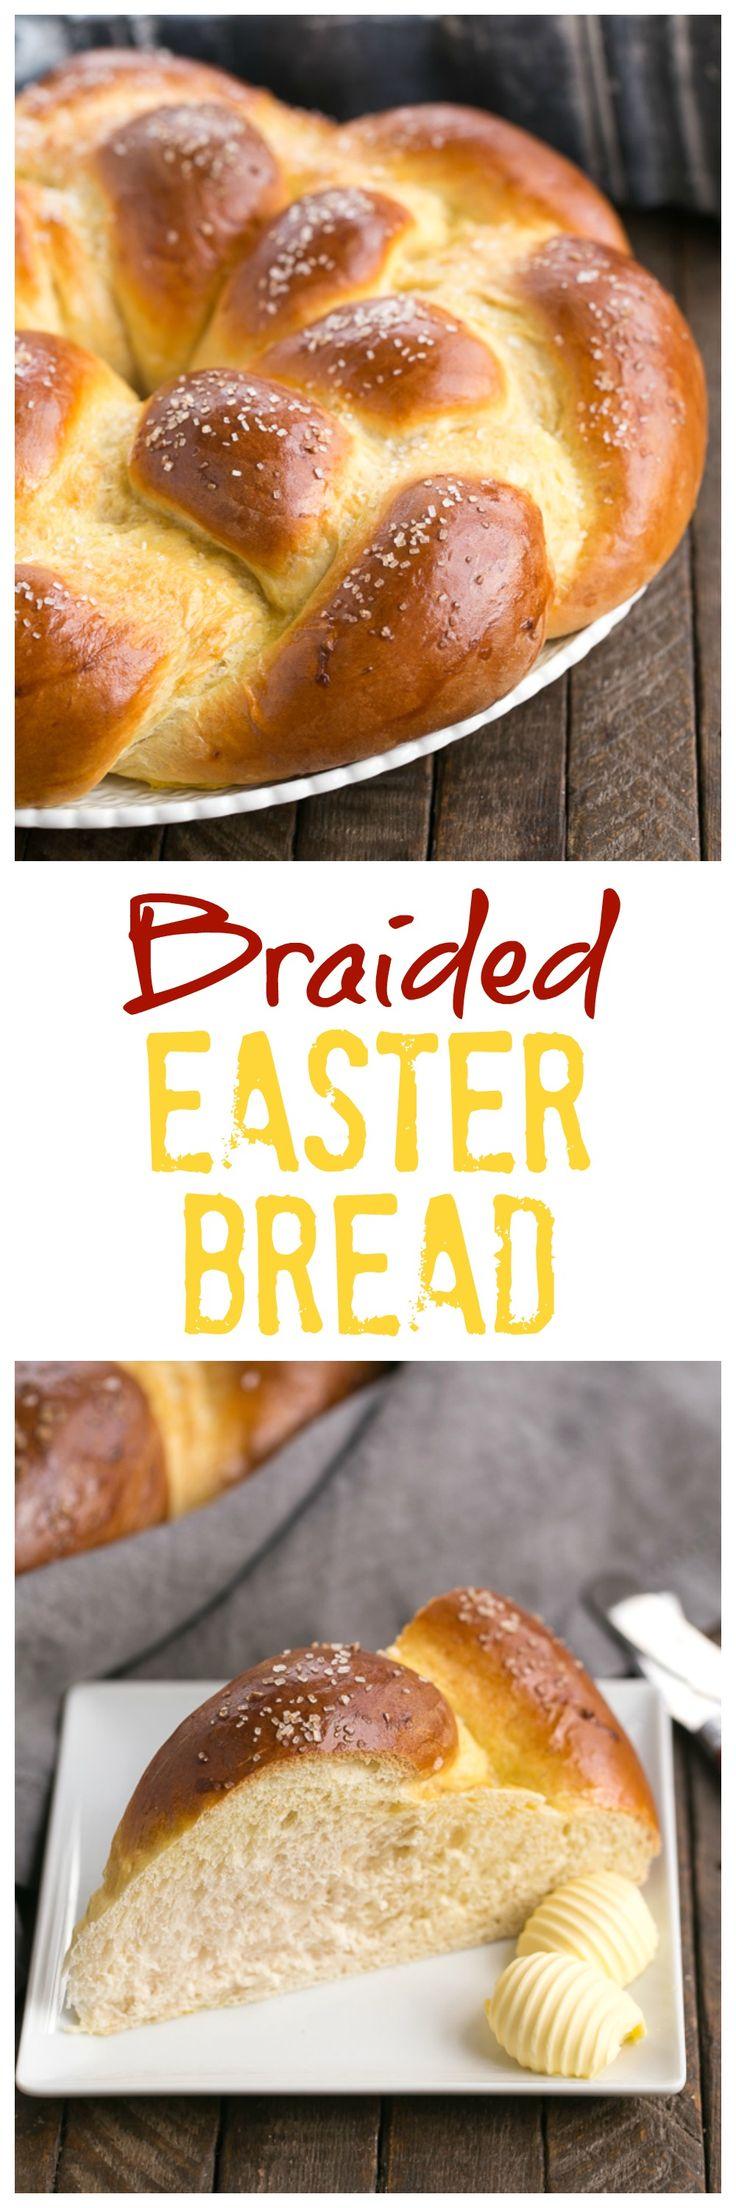 17 Best ideas about Easter Bread Recipe on Pinterest ...